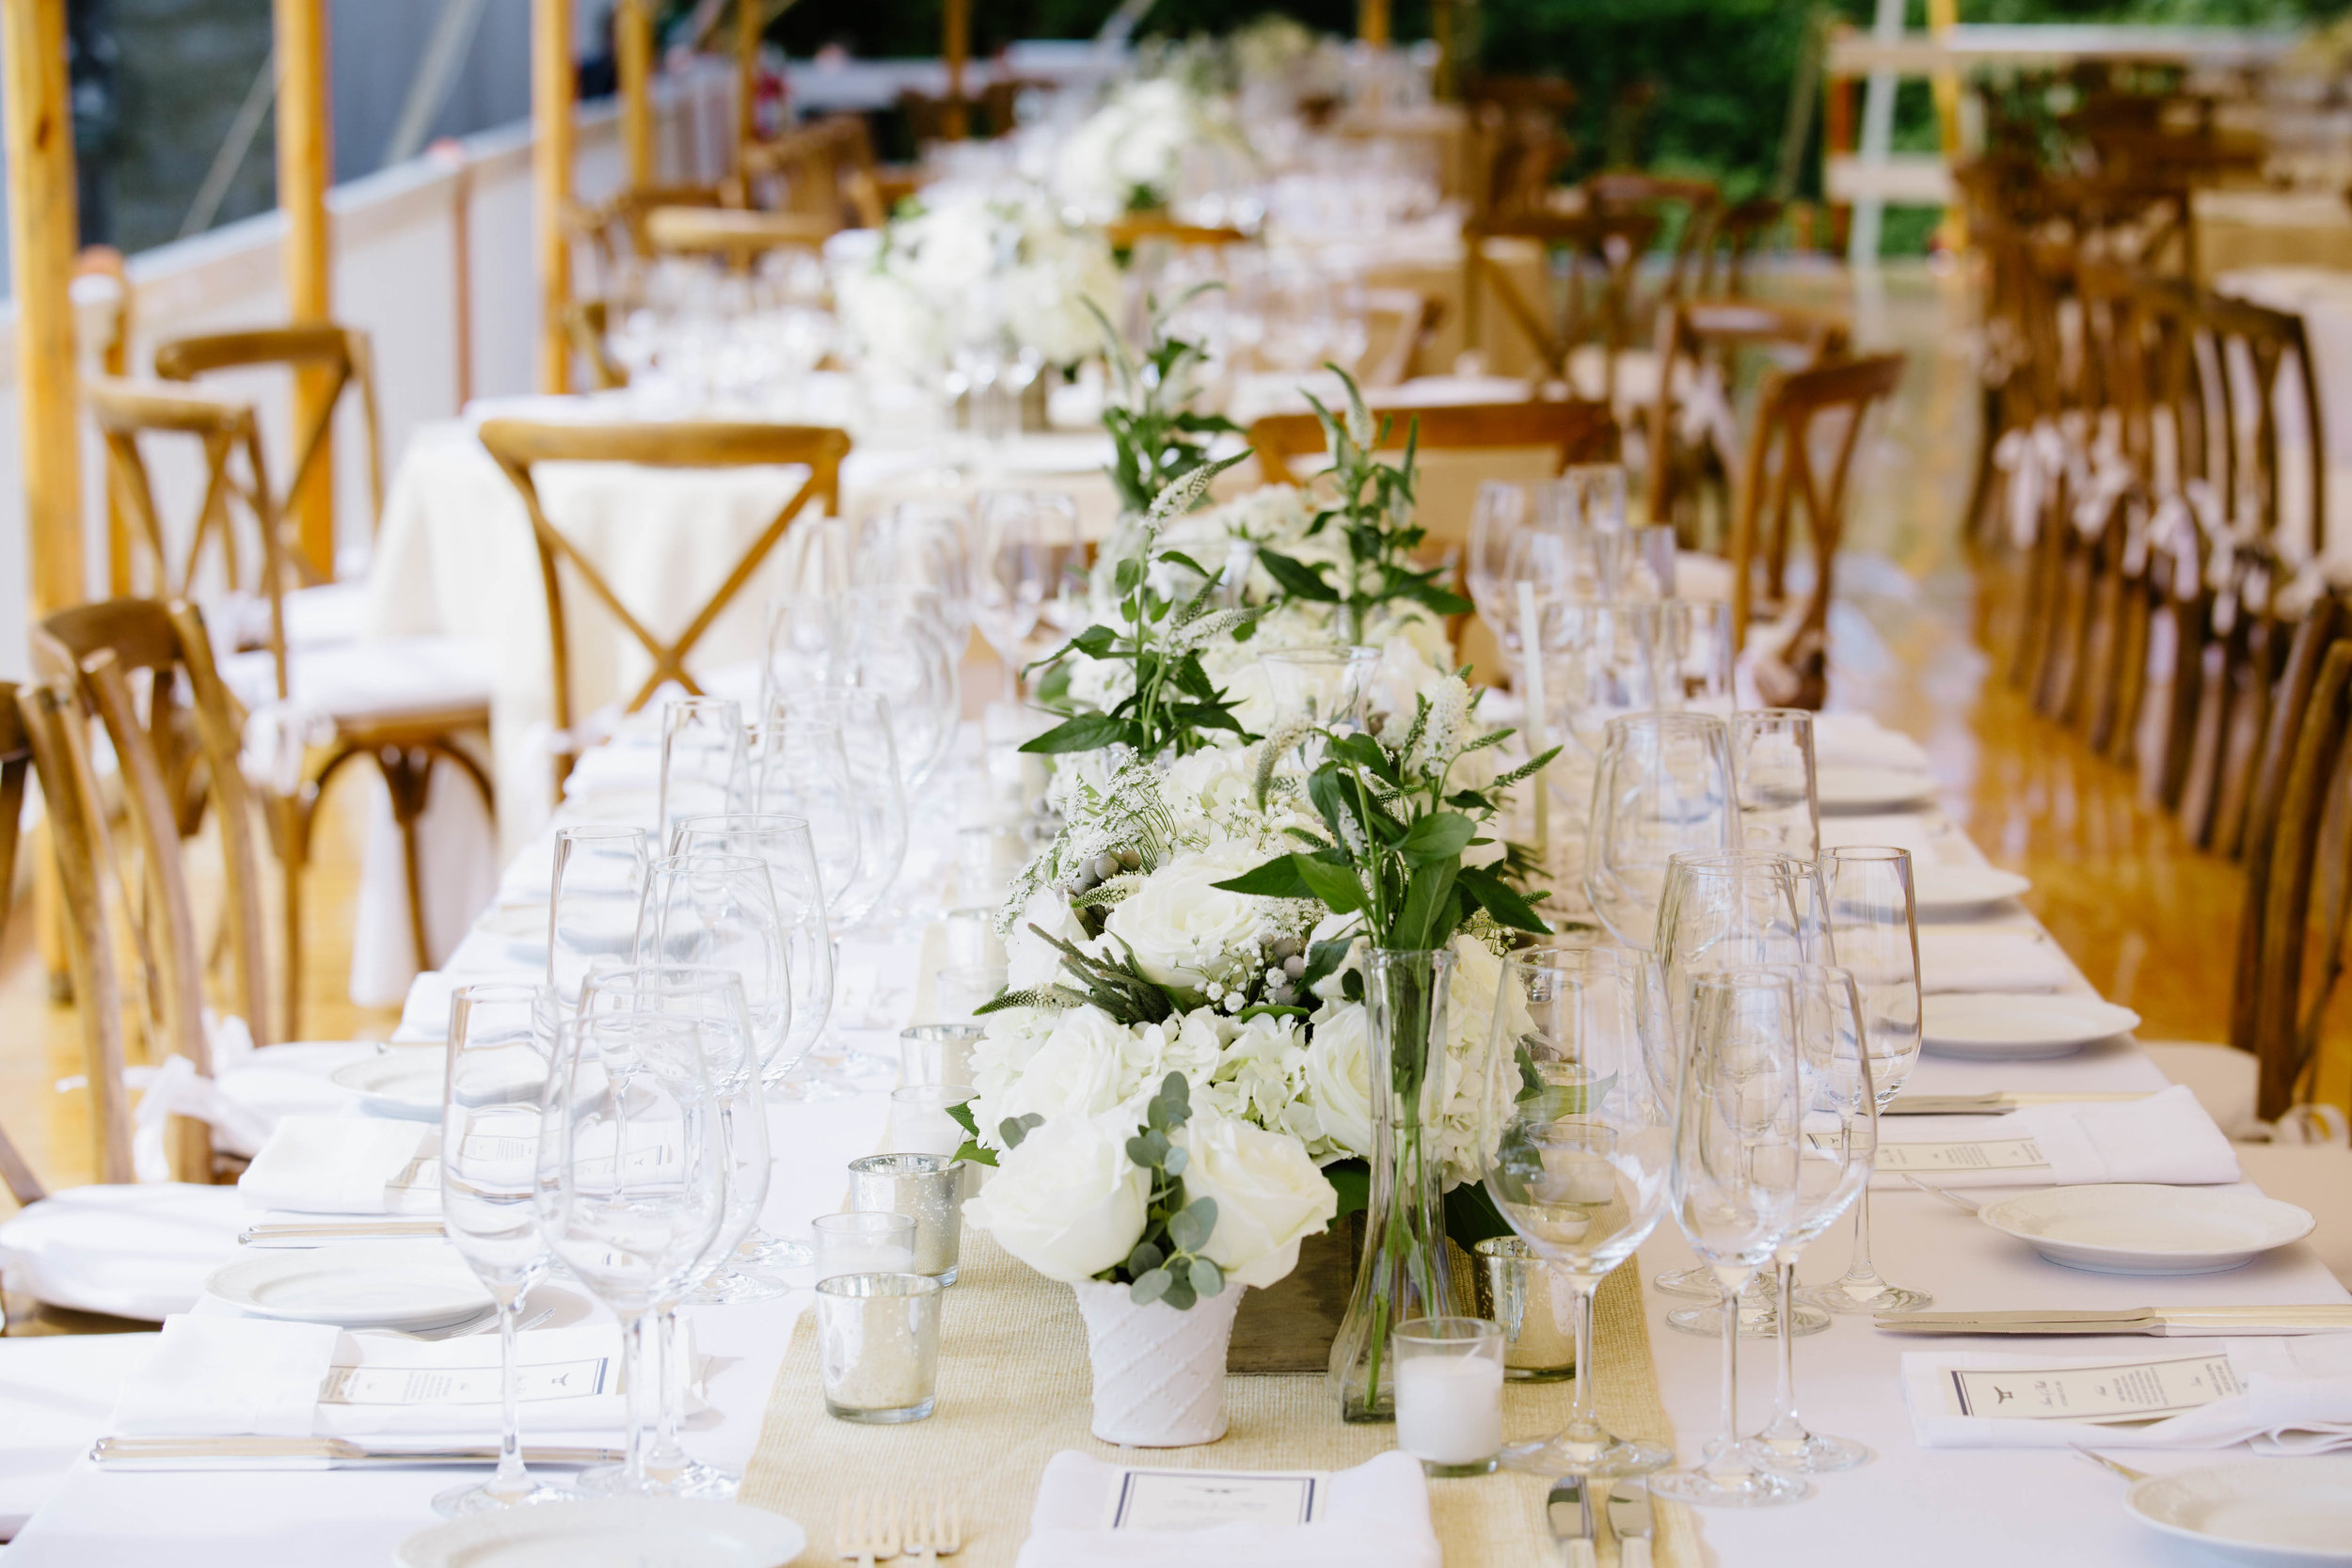 Candid-Wedding-Photography010.jpg